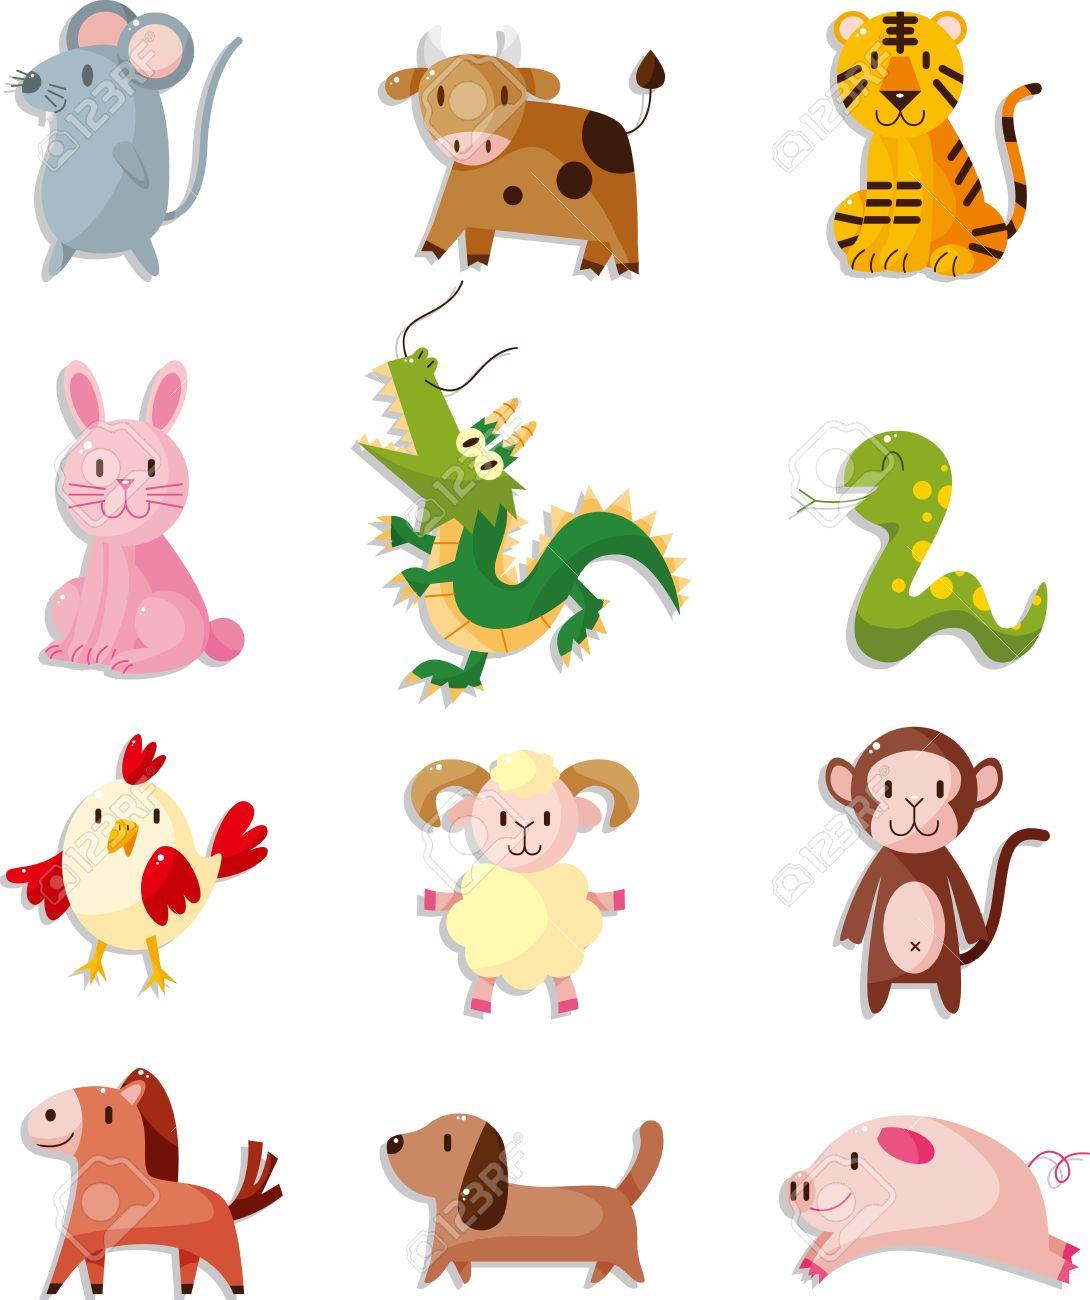 12 animal icon set,Chinese Zodiac animal.